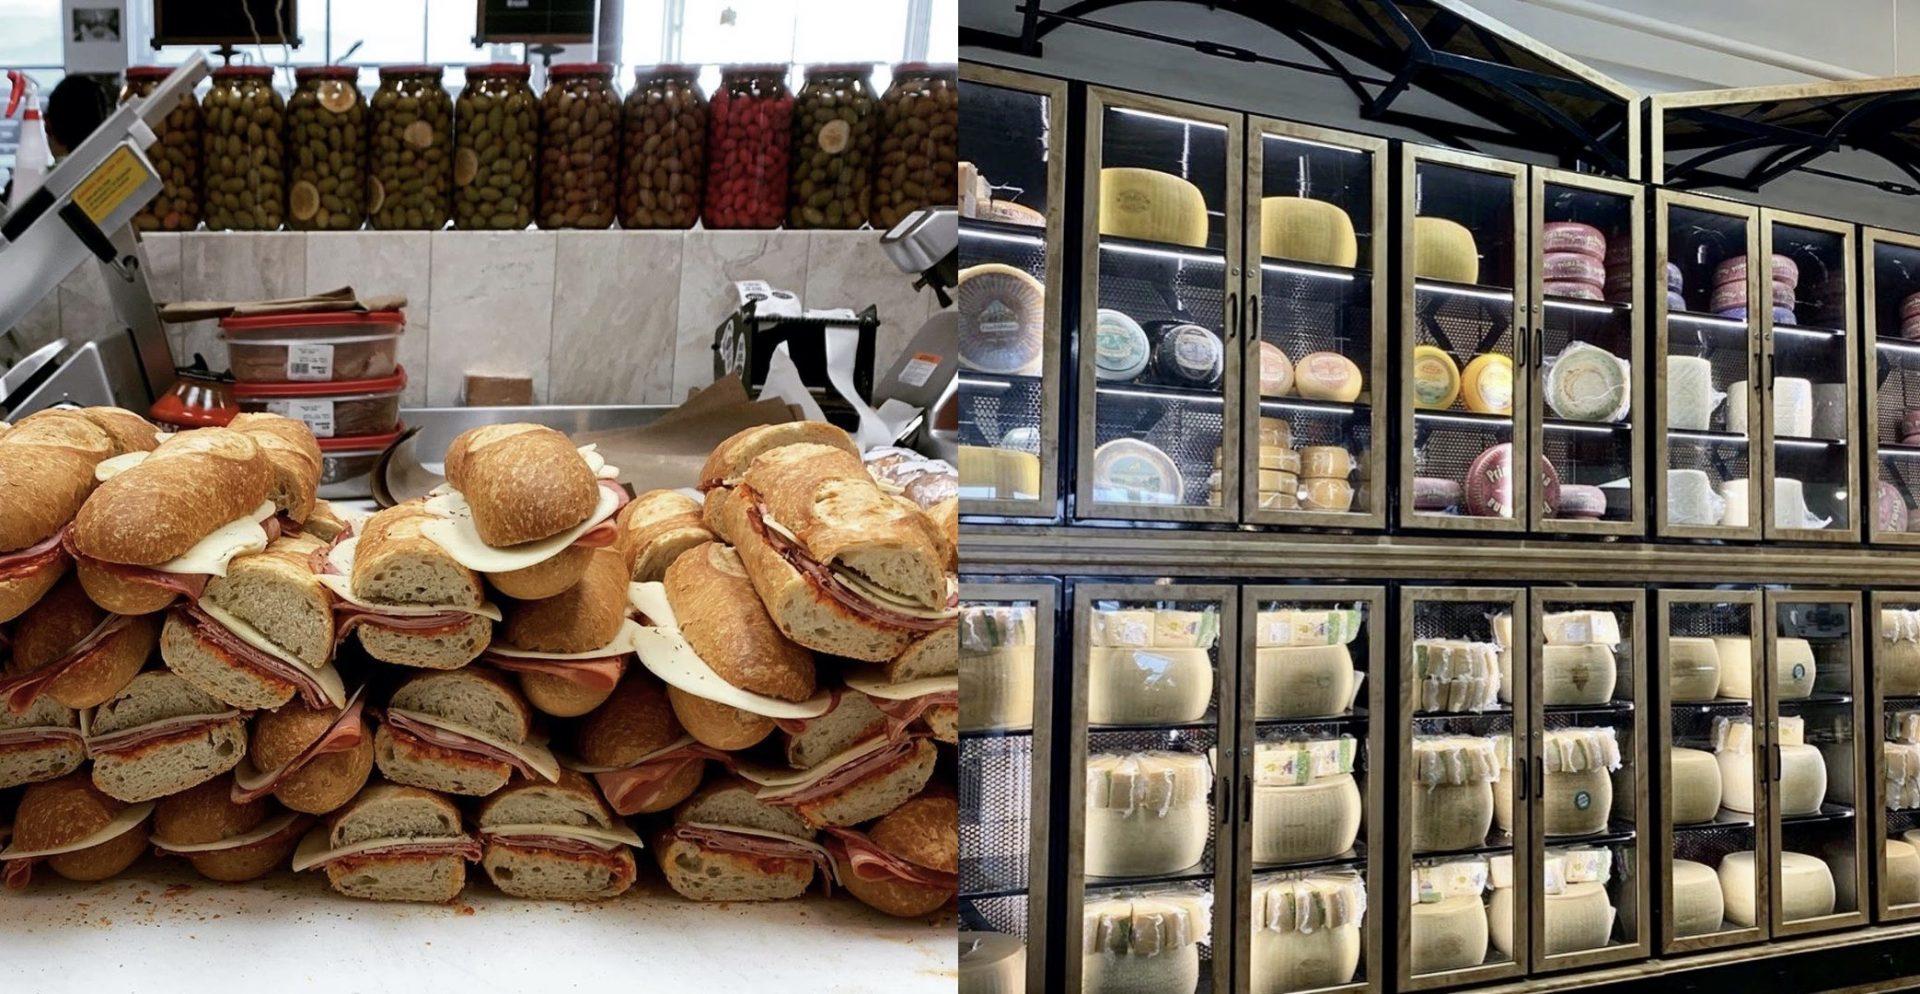 Alberta-based Italian Centre Shop to open new Sherwood Park location